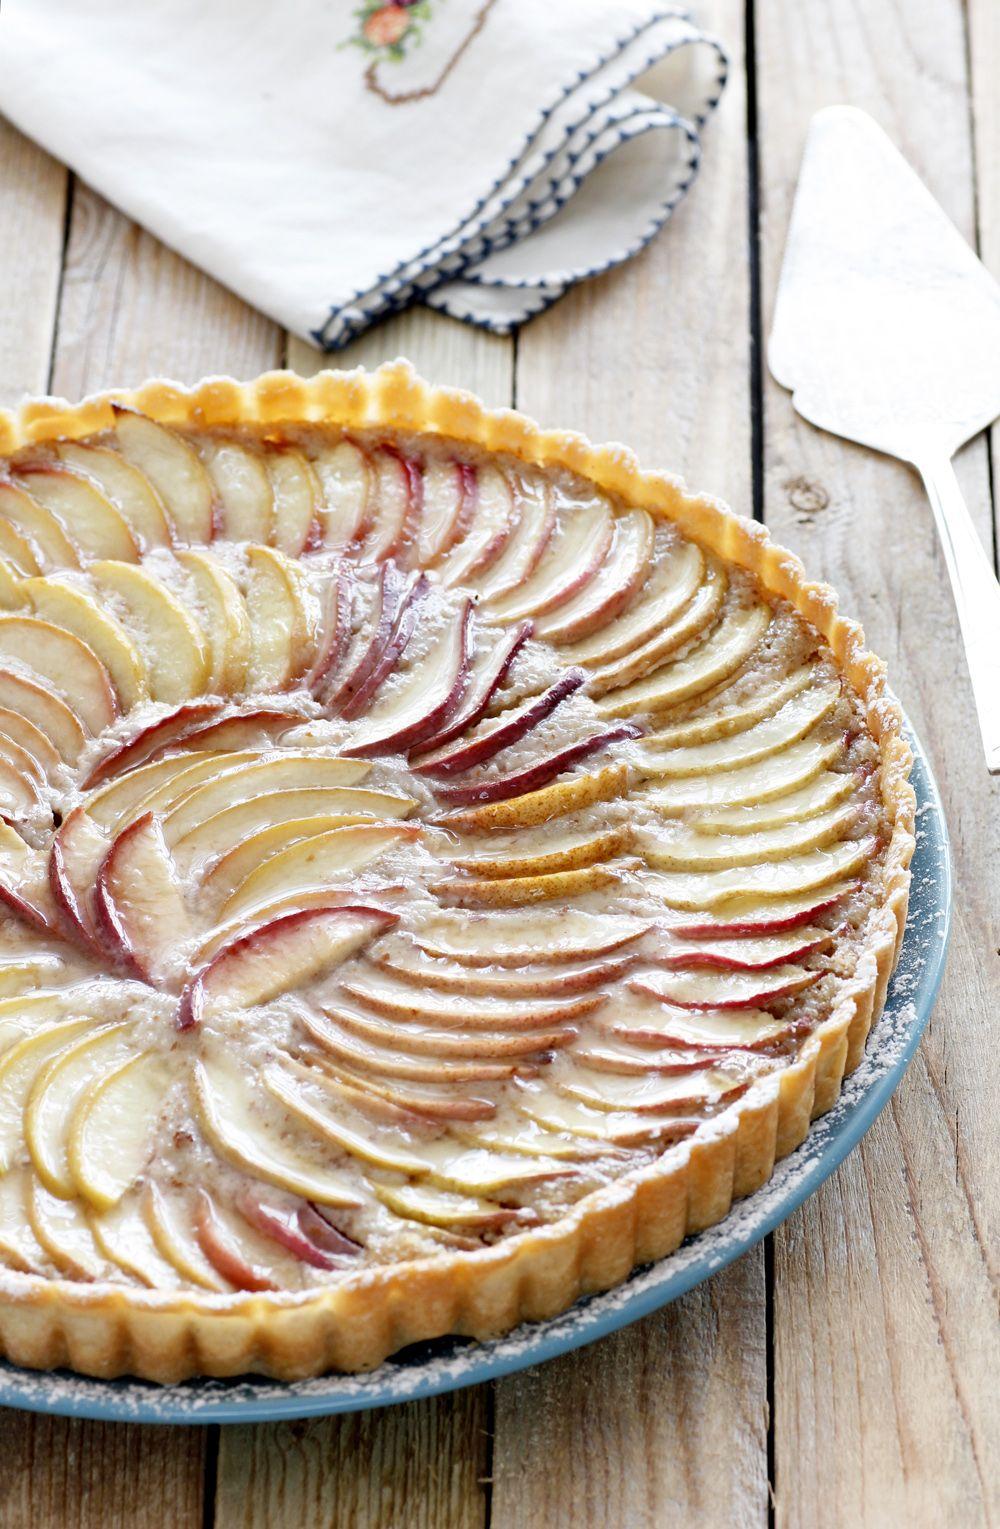 Peach and Almond Pie